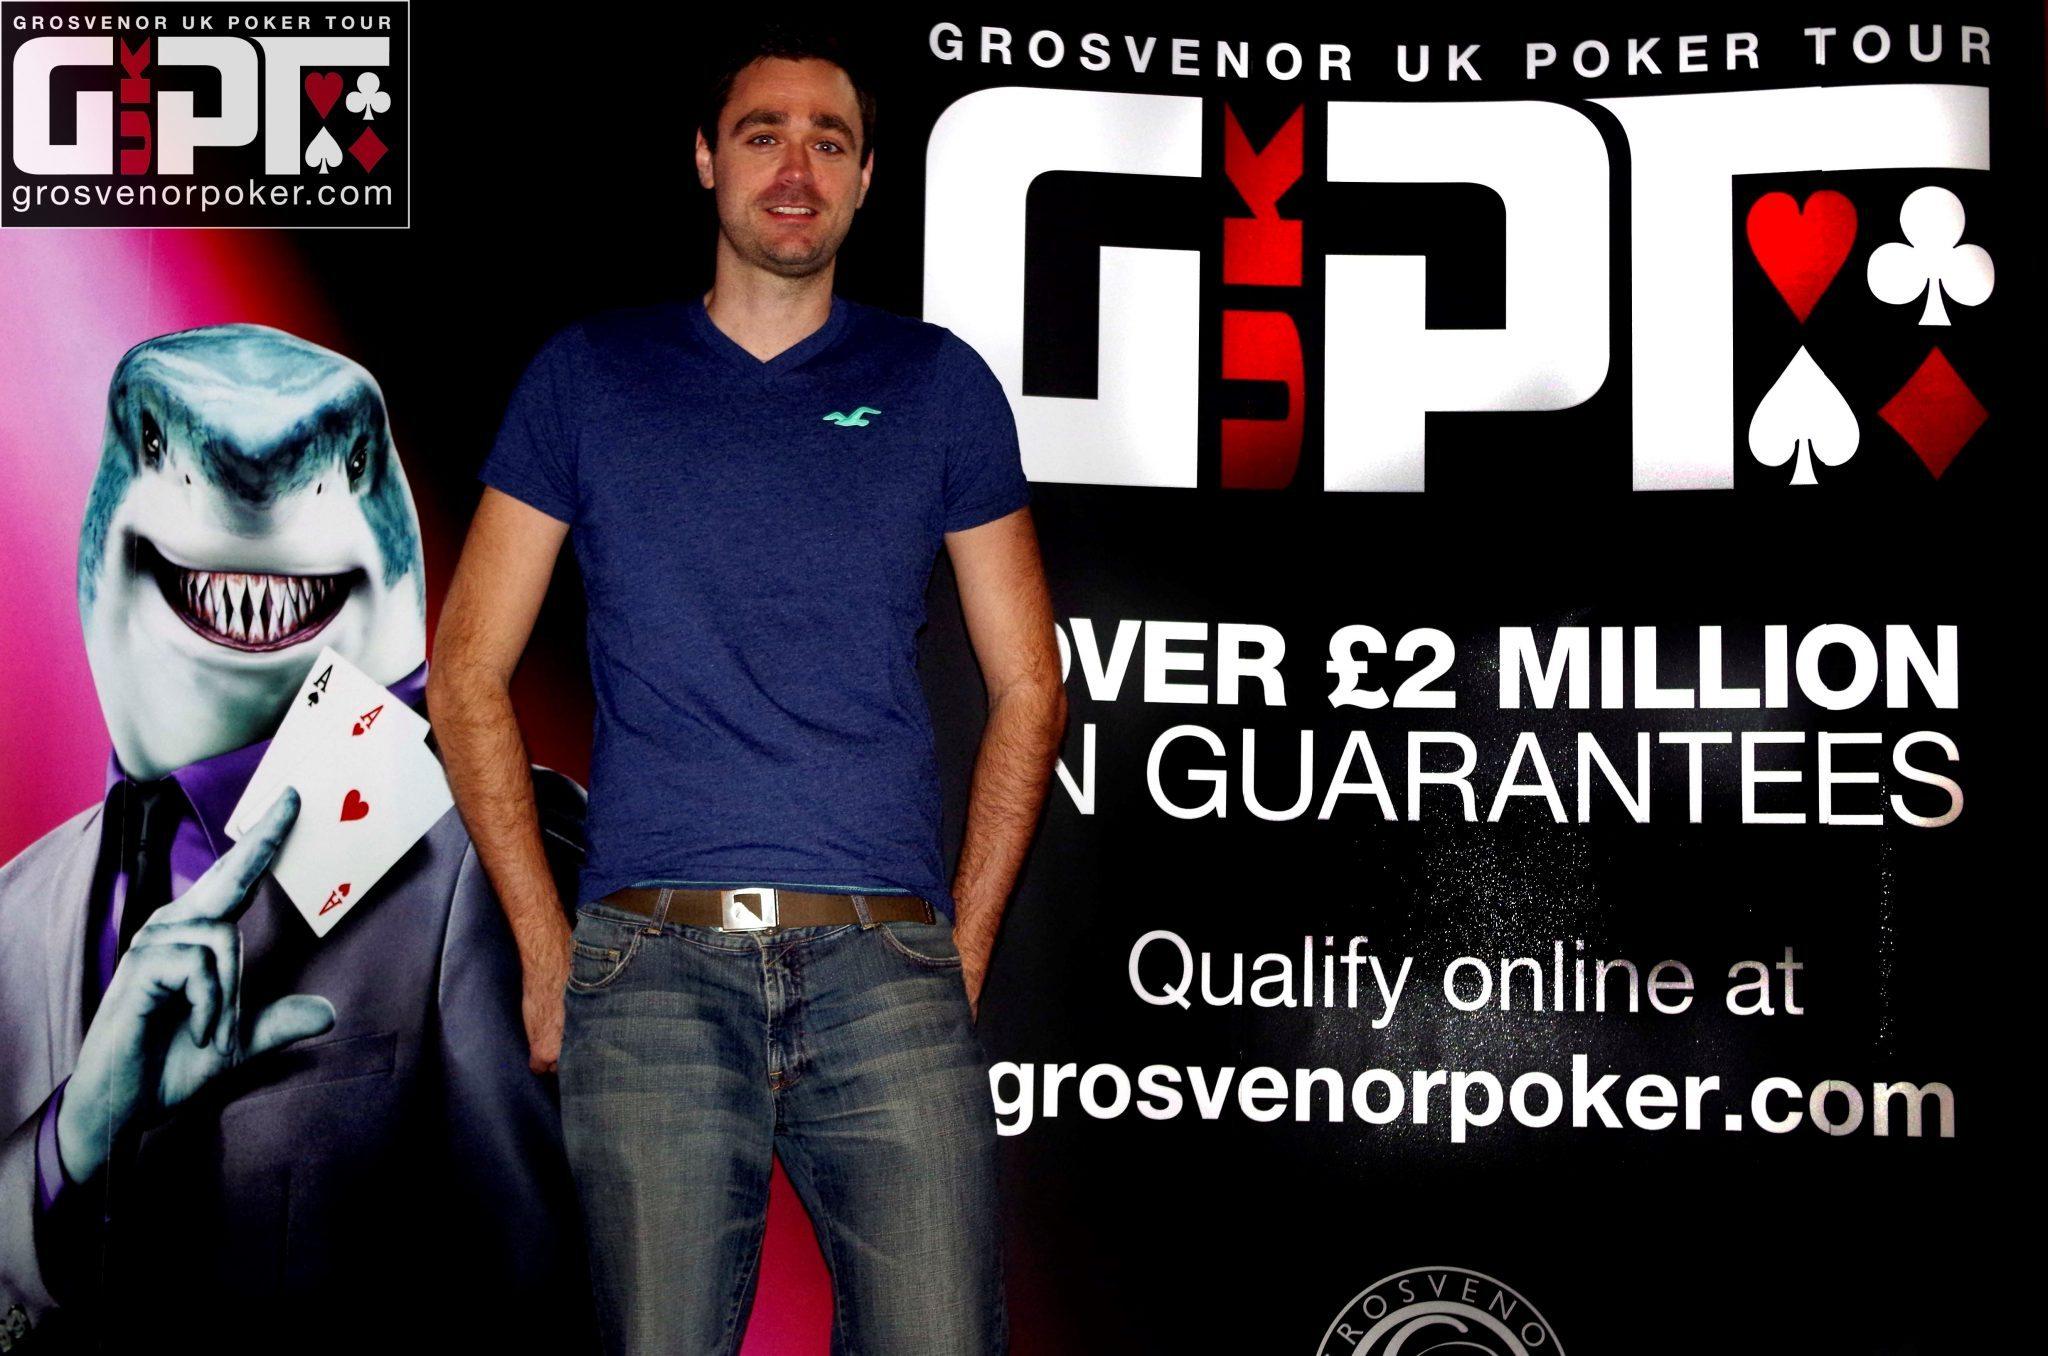 g casino luton live poker stream